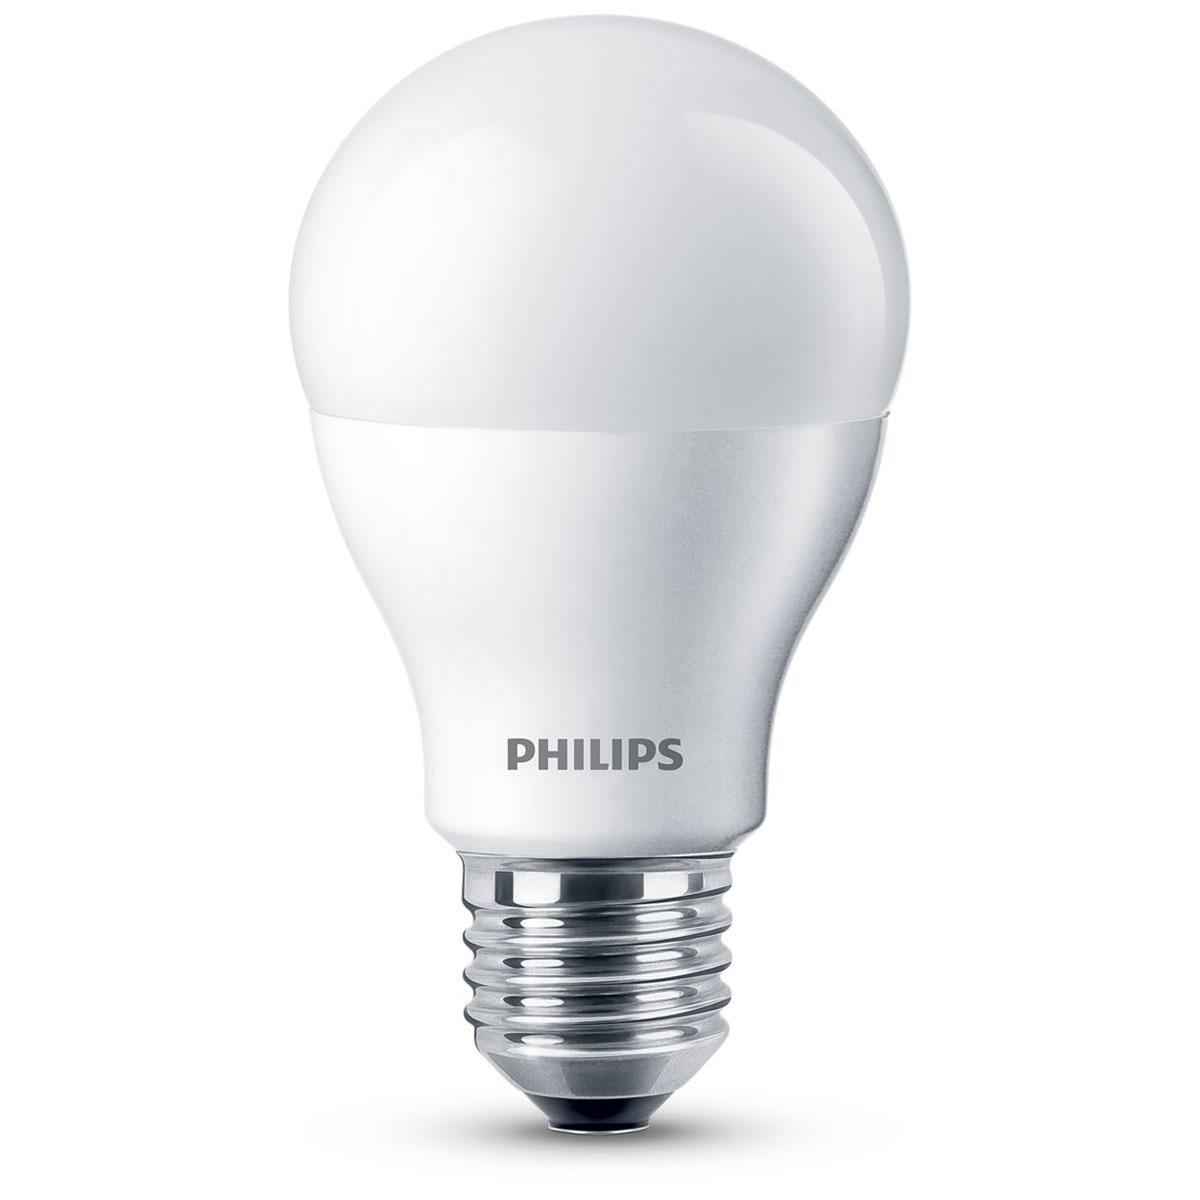 Philips Led Lampe : philips led lamp mat 10w 60w e27 dimbaar ~ Watch28wear.com Haus und Dekorationen